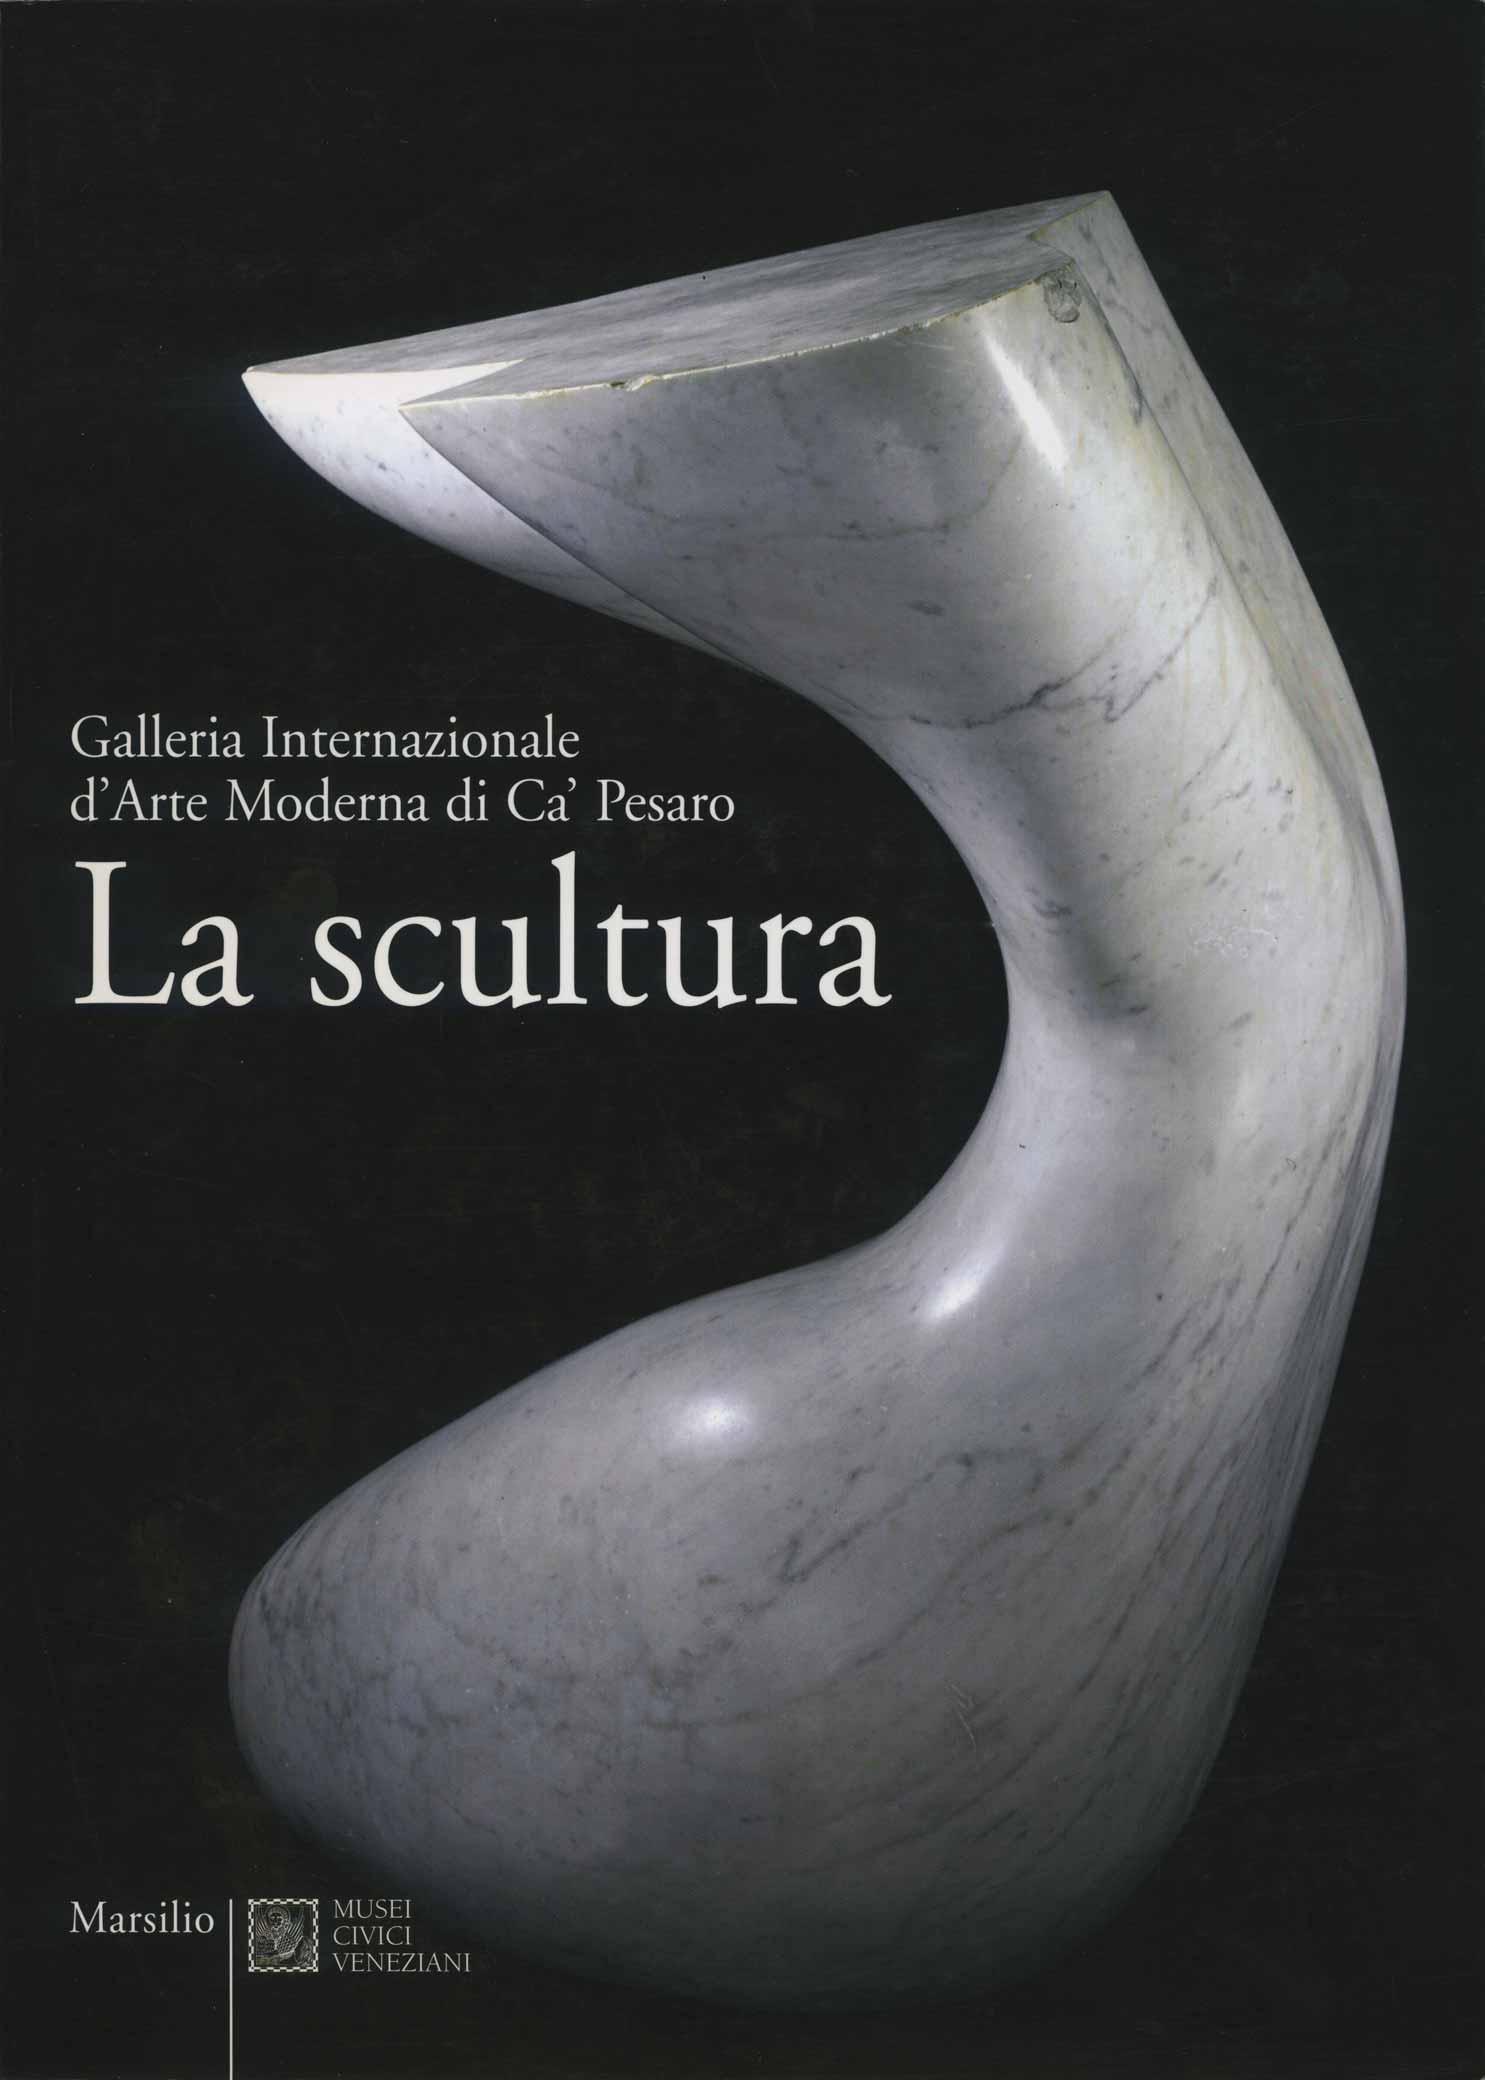 Metamorphosis, Antonio Maccà